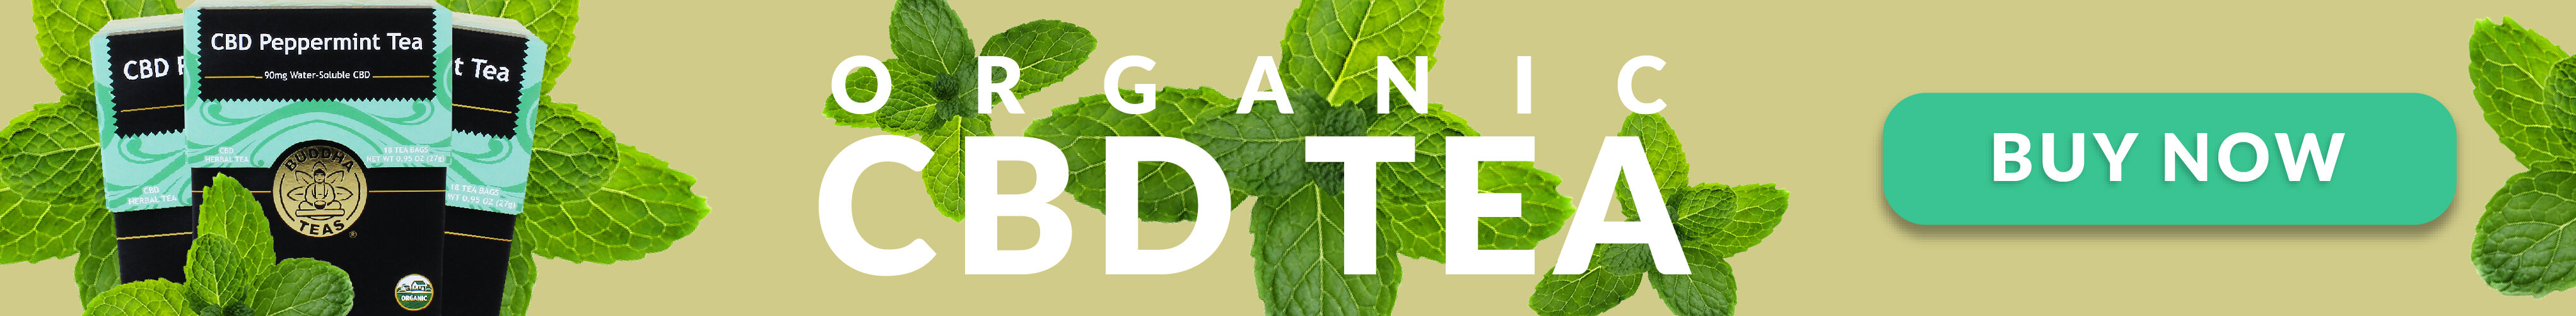 How to Make Your Own CBD Tea  CBD Tea Recipe [2019] Daintri